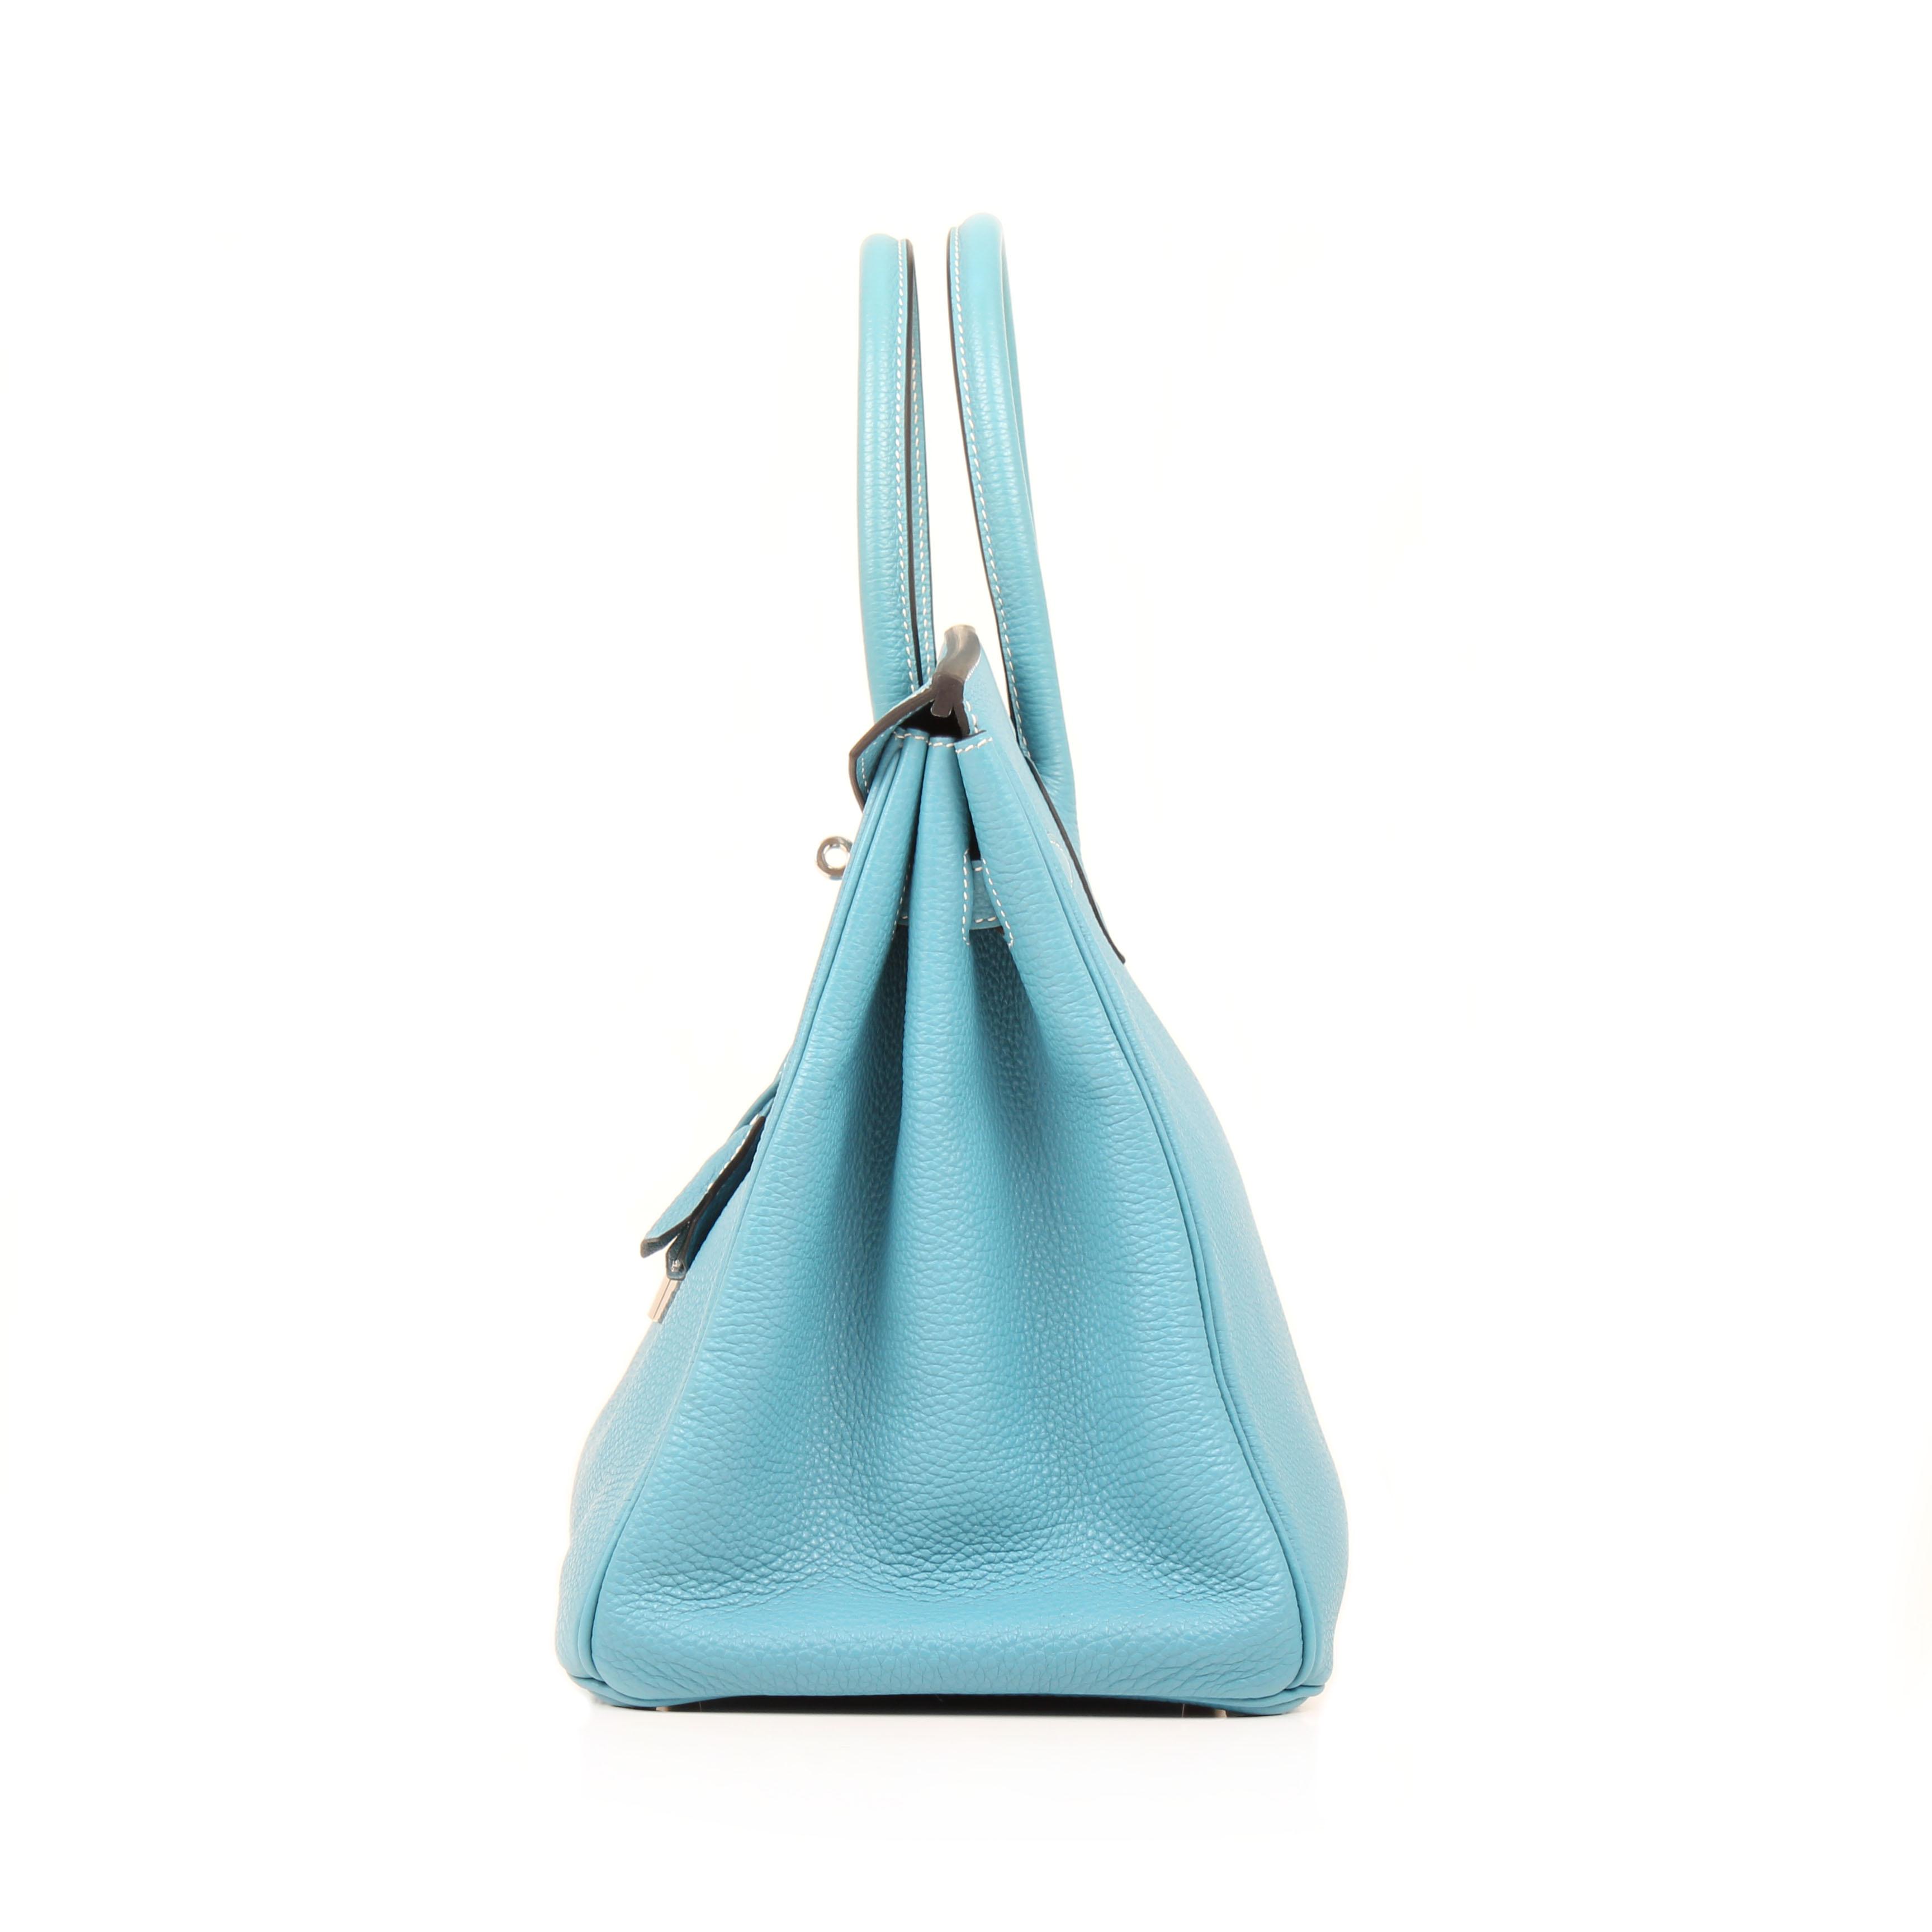 084c3ccb10 Hermès Birkin Bag 35 Togo Leather Blue Jean I CBL Bags